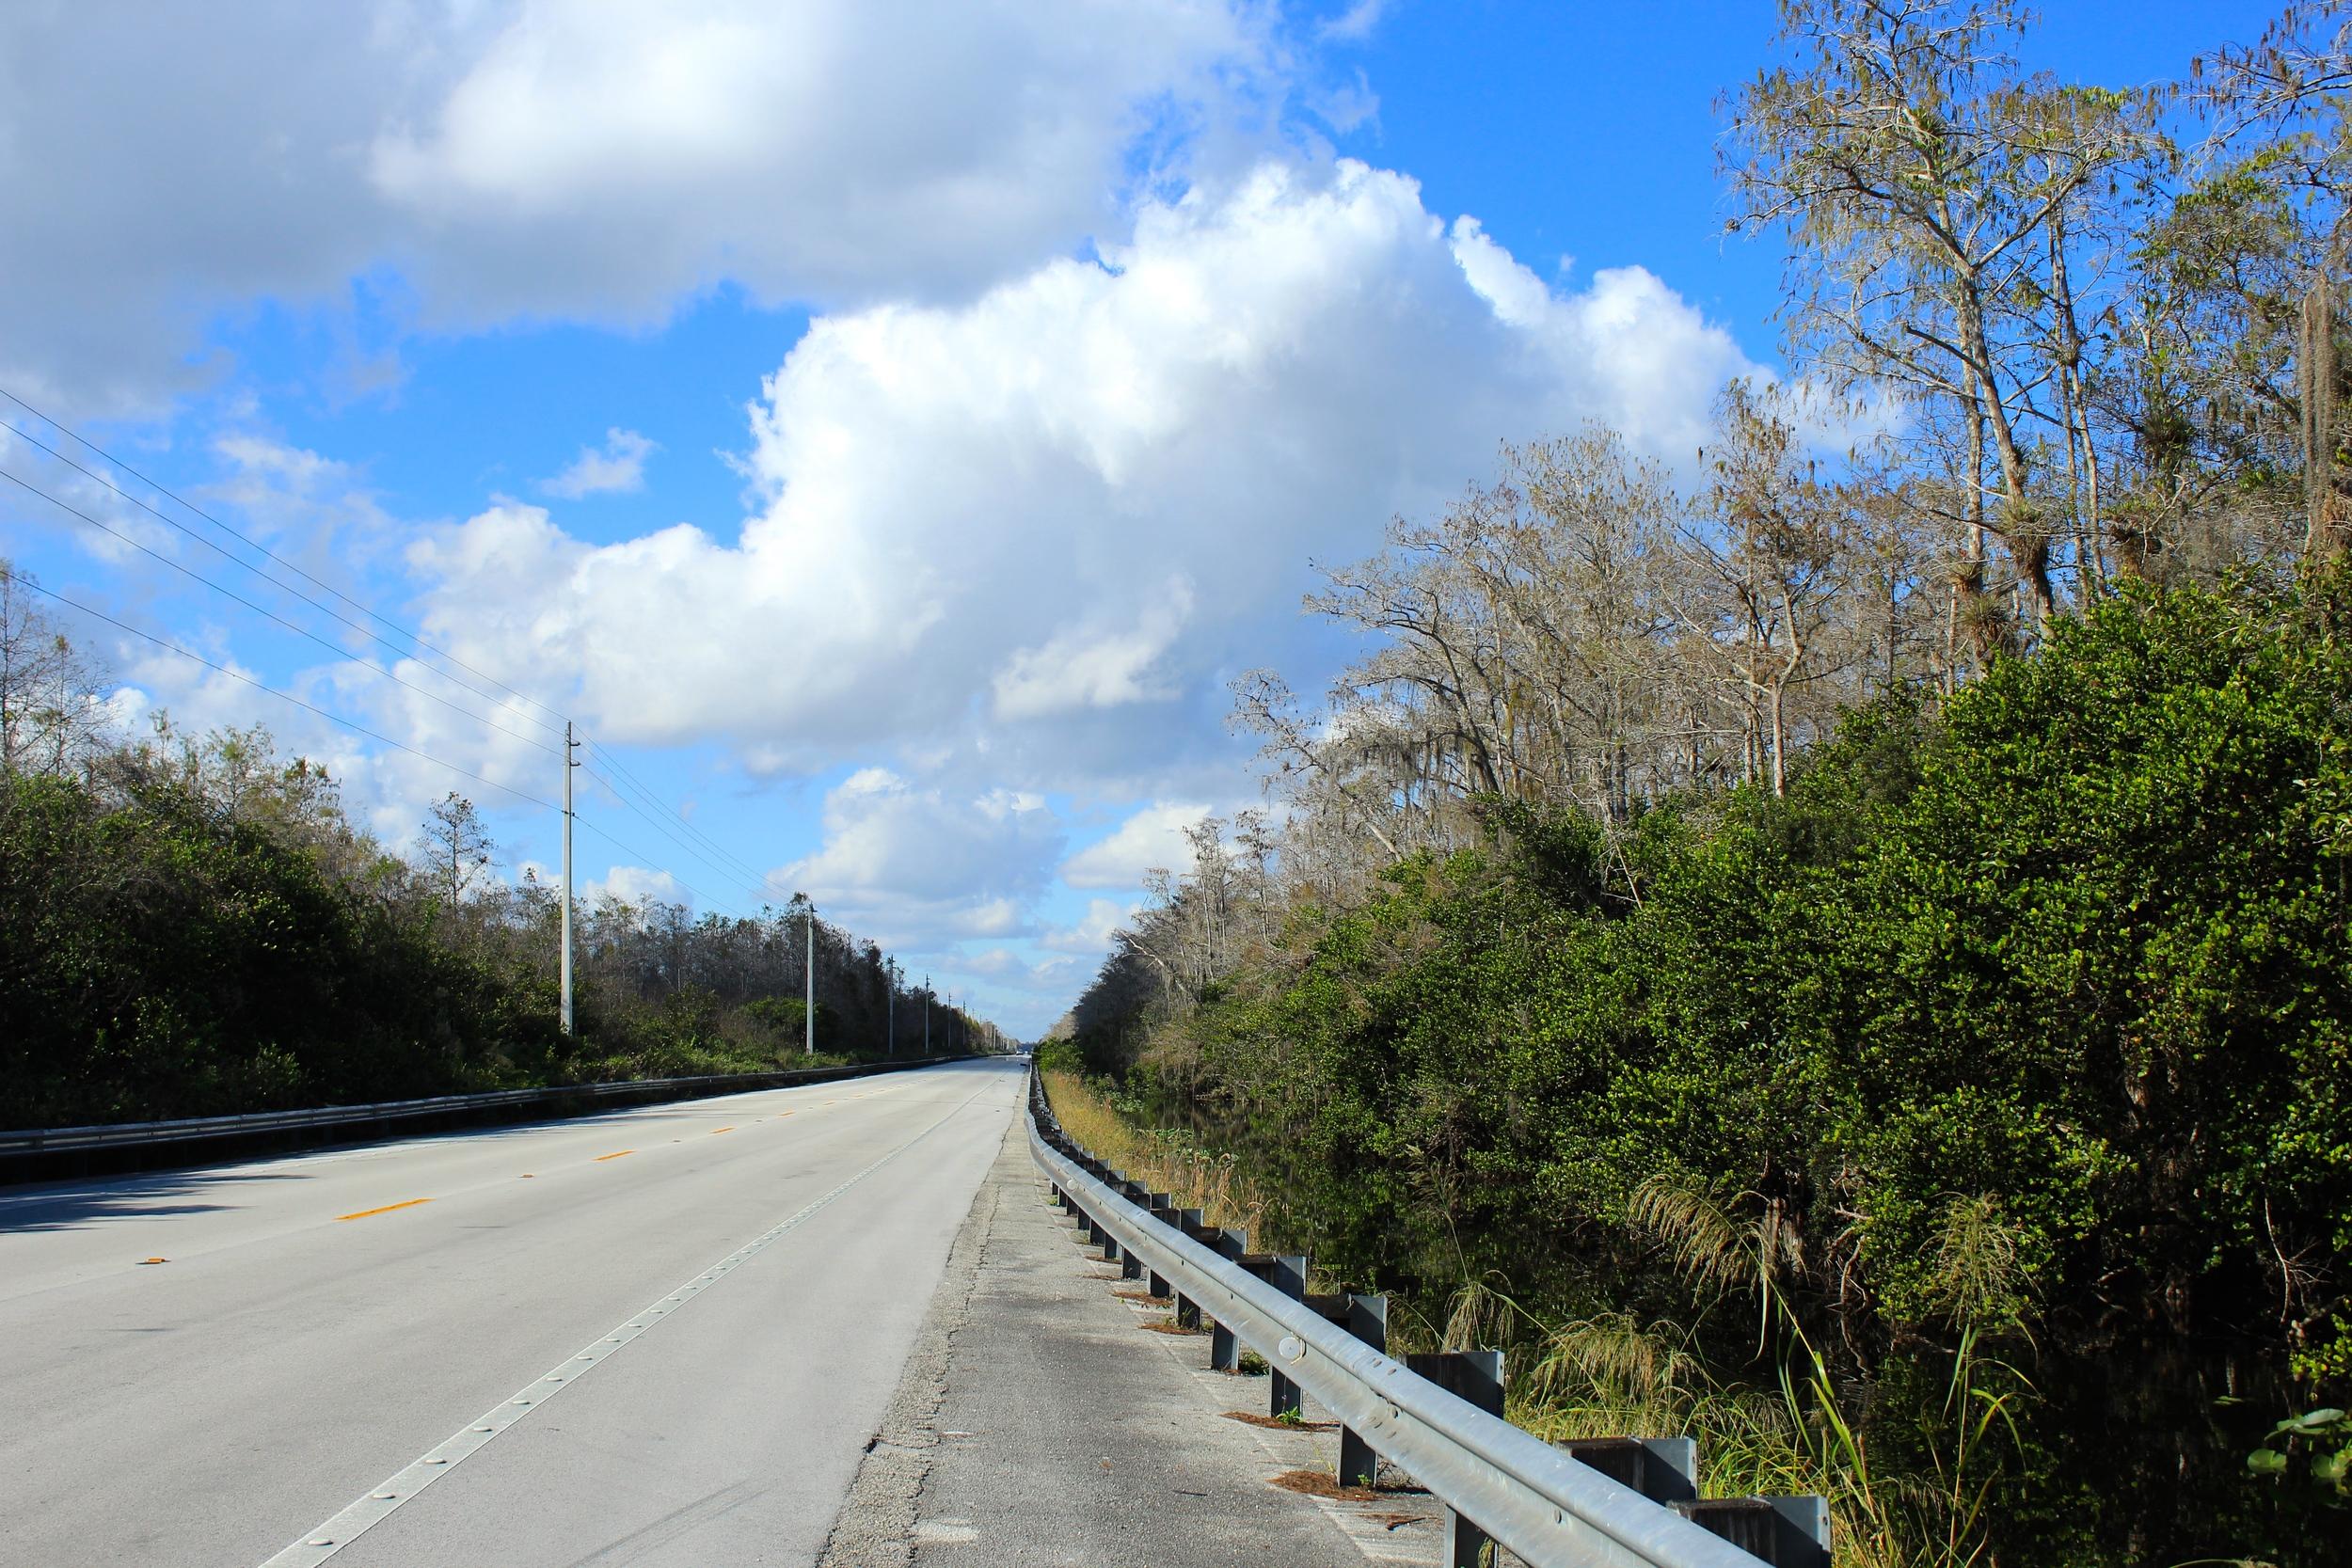 Everglade Roadside